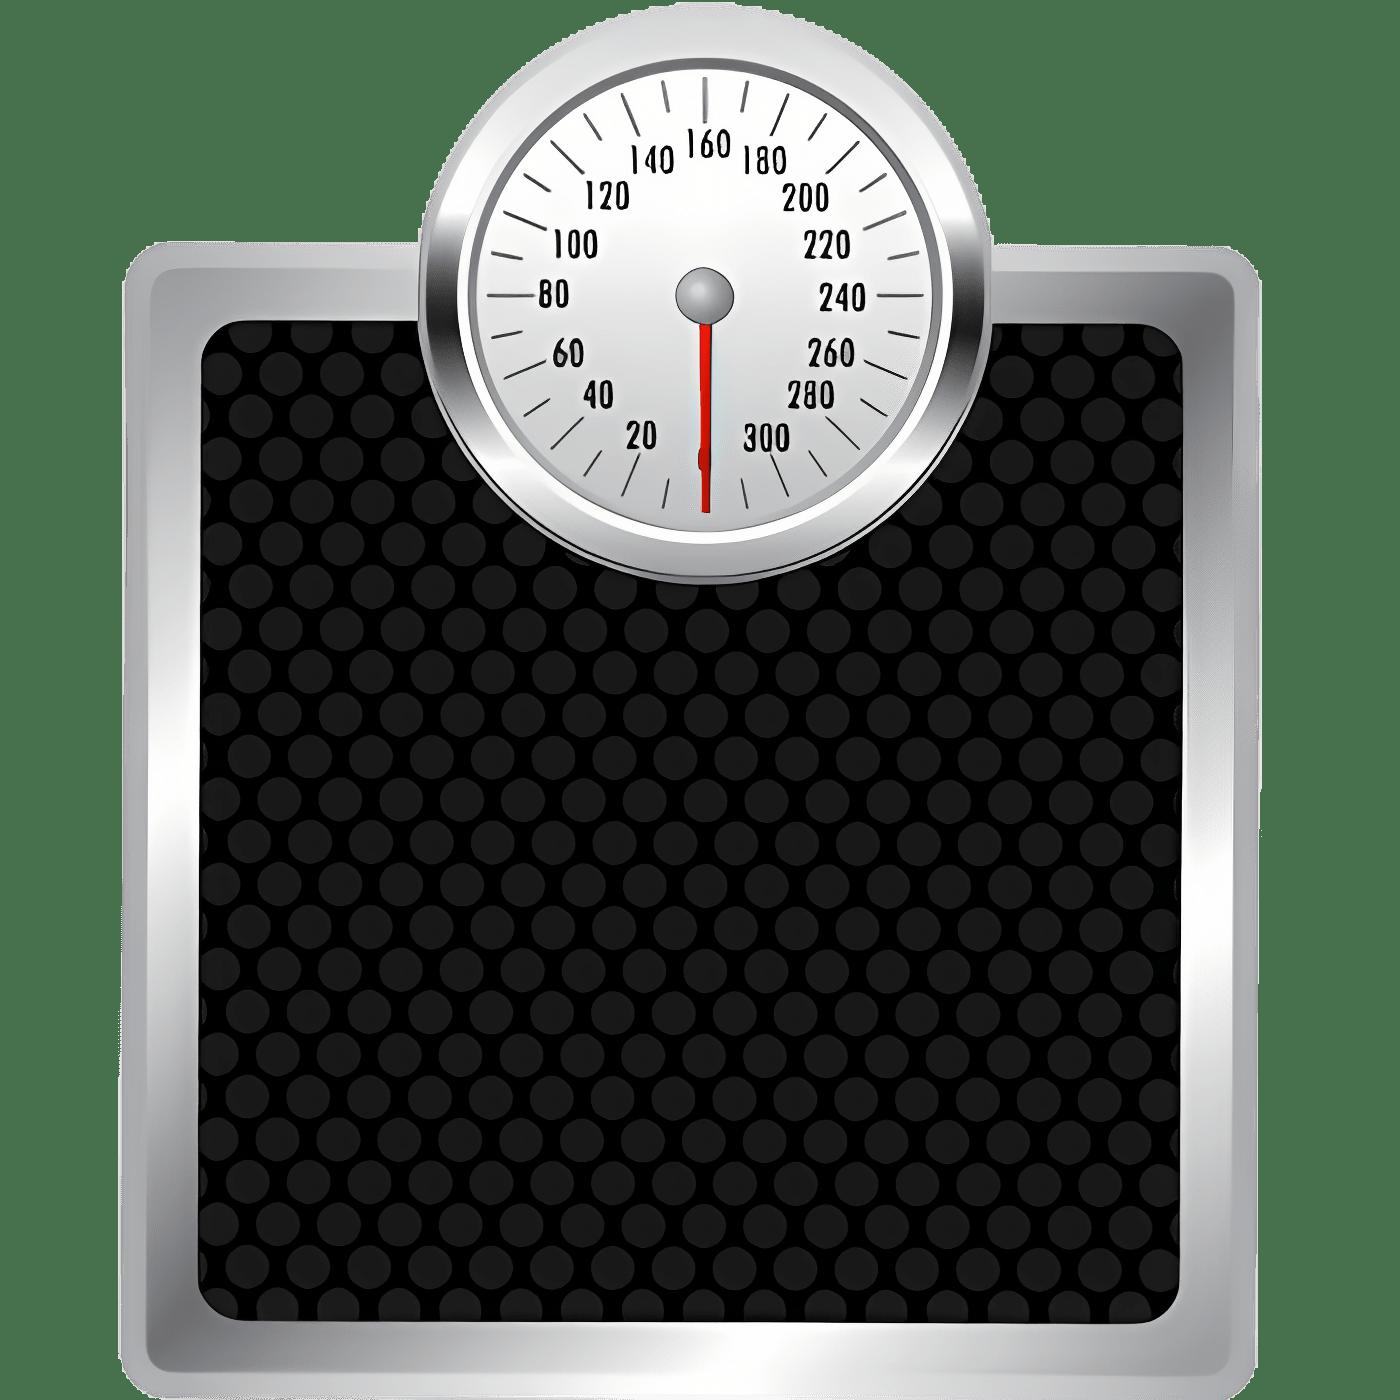 Weight Computer 1.6.2